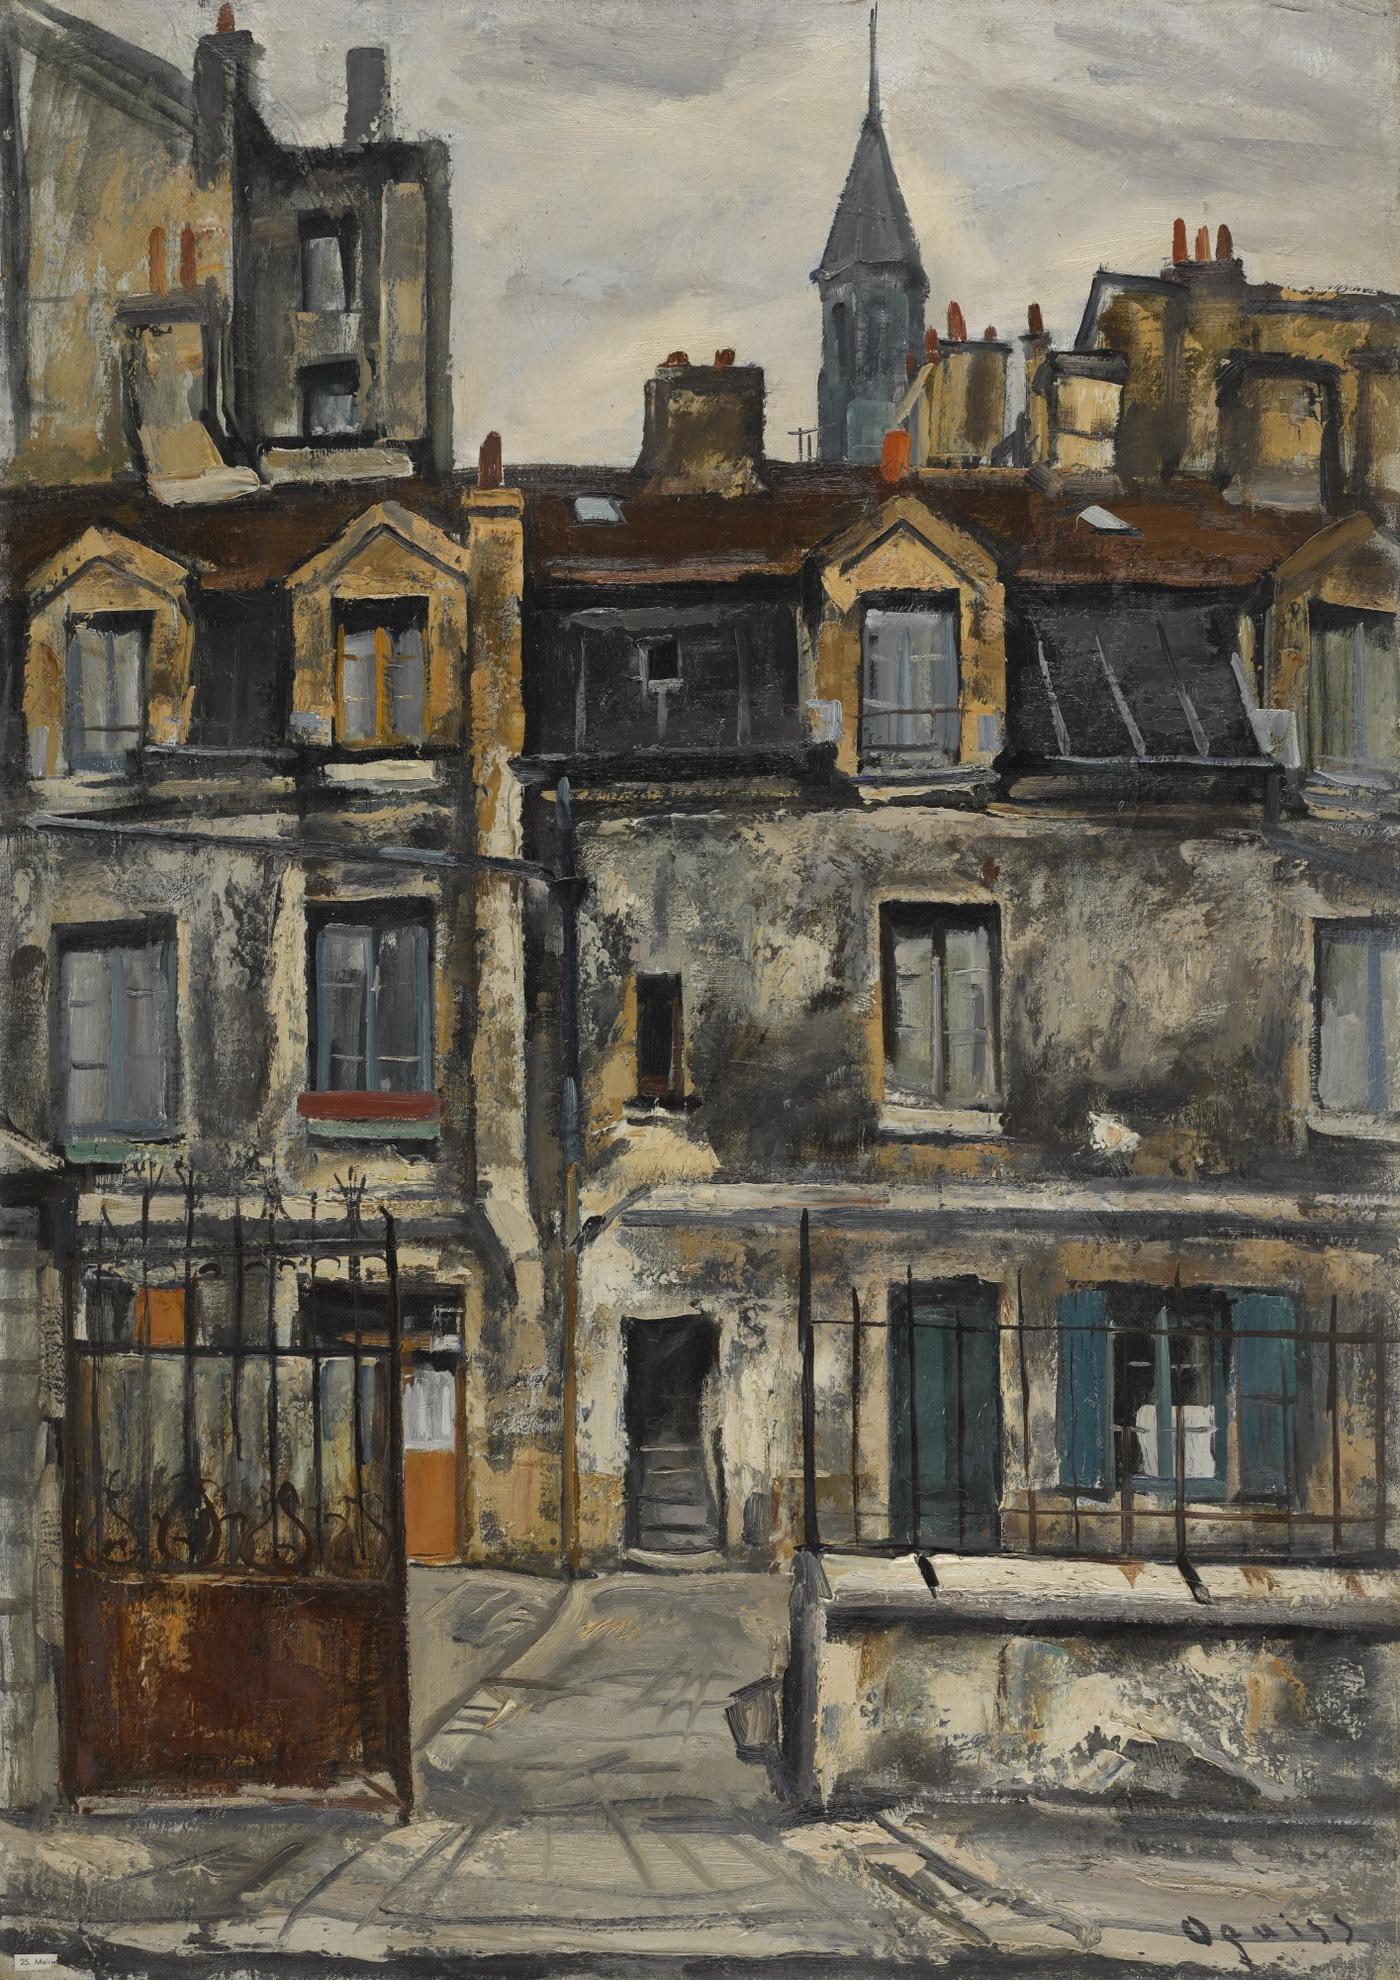 Takanori Oguiss - Mairie De Saint-Denis, Le Beffroi-1951